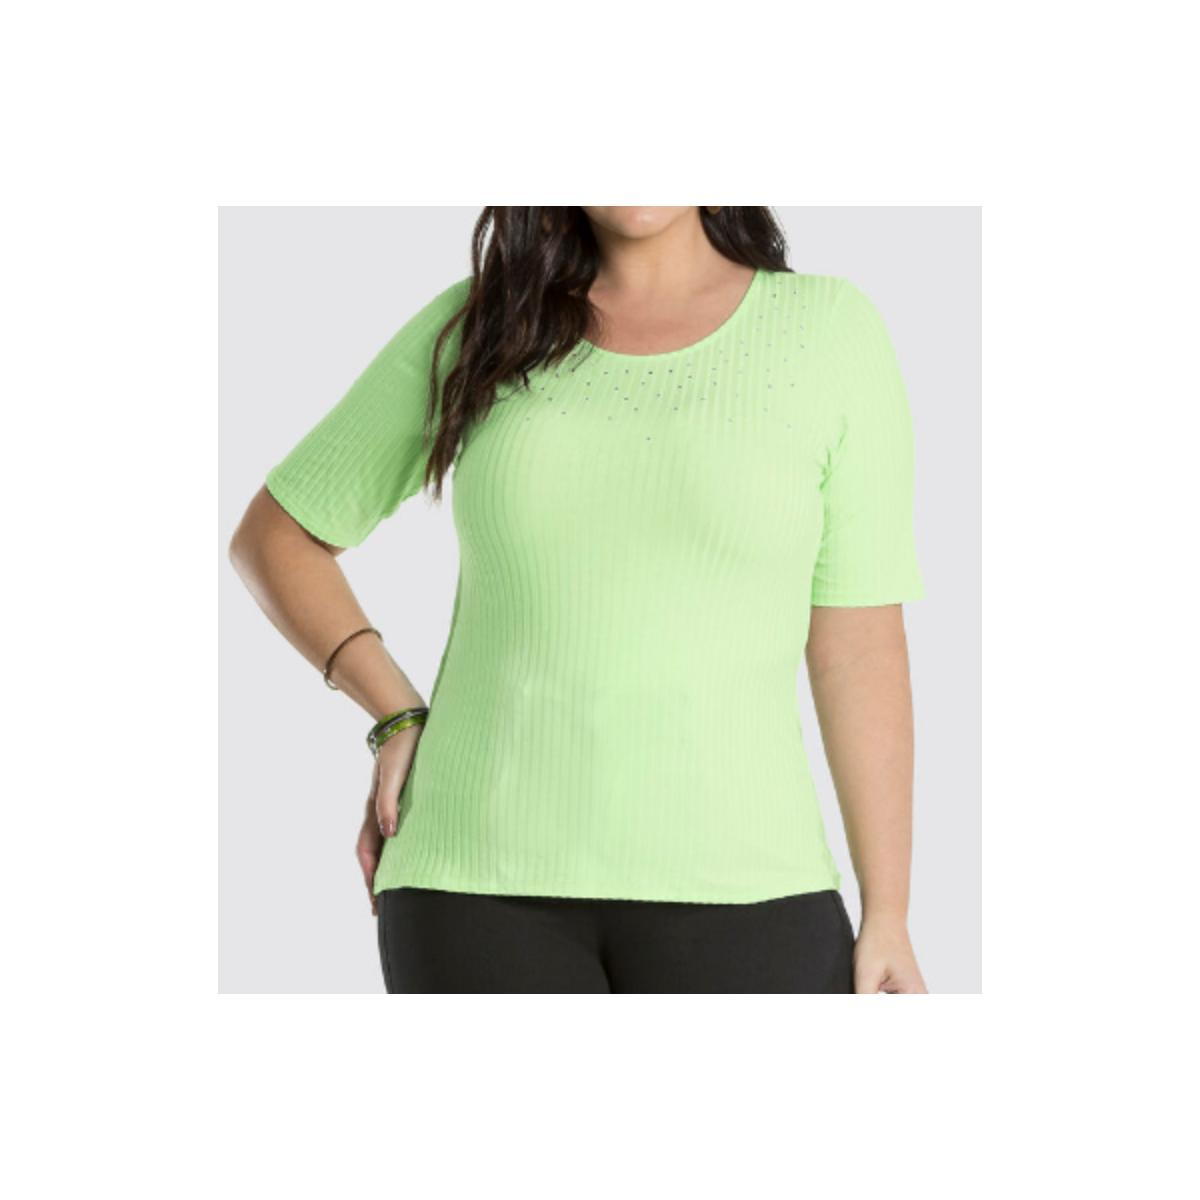 Blusa Feminina Lunender 47115 Verde